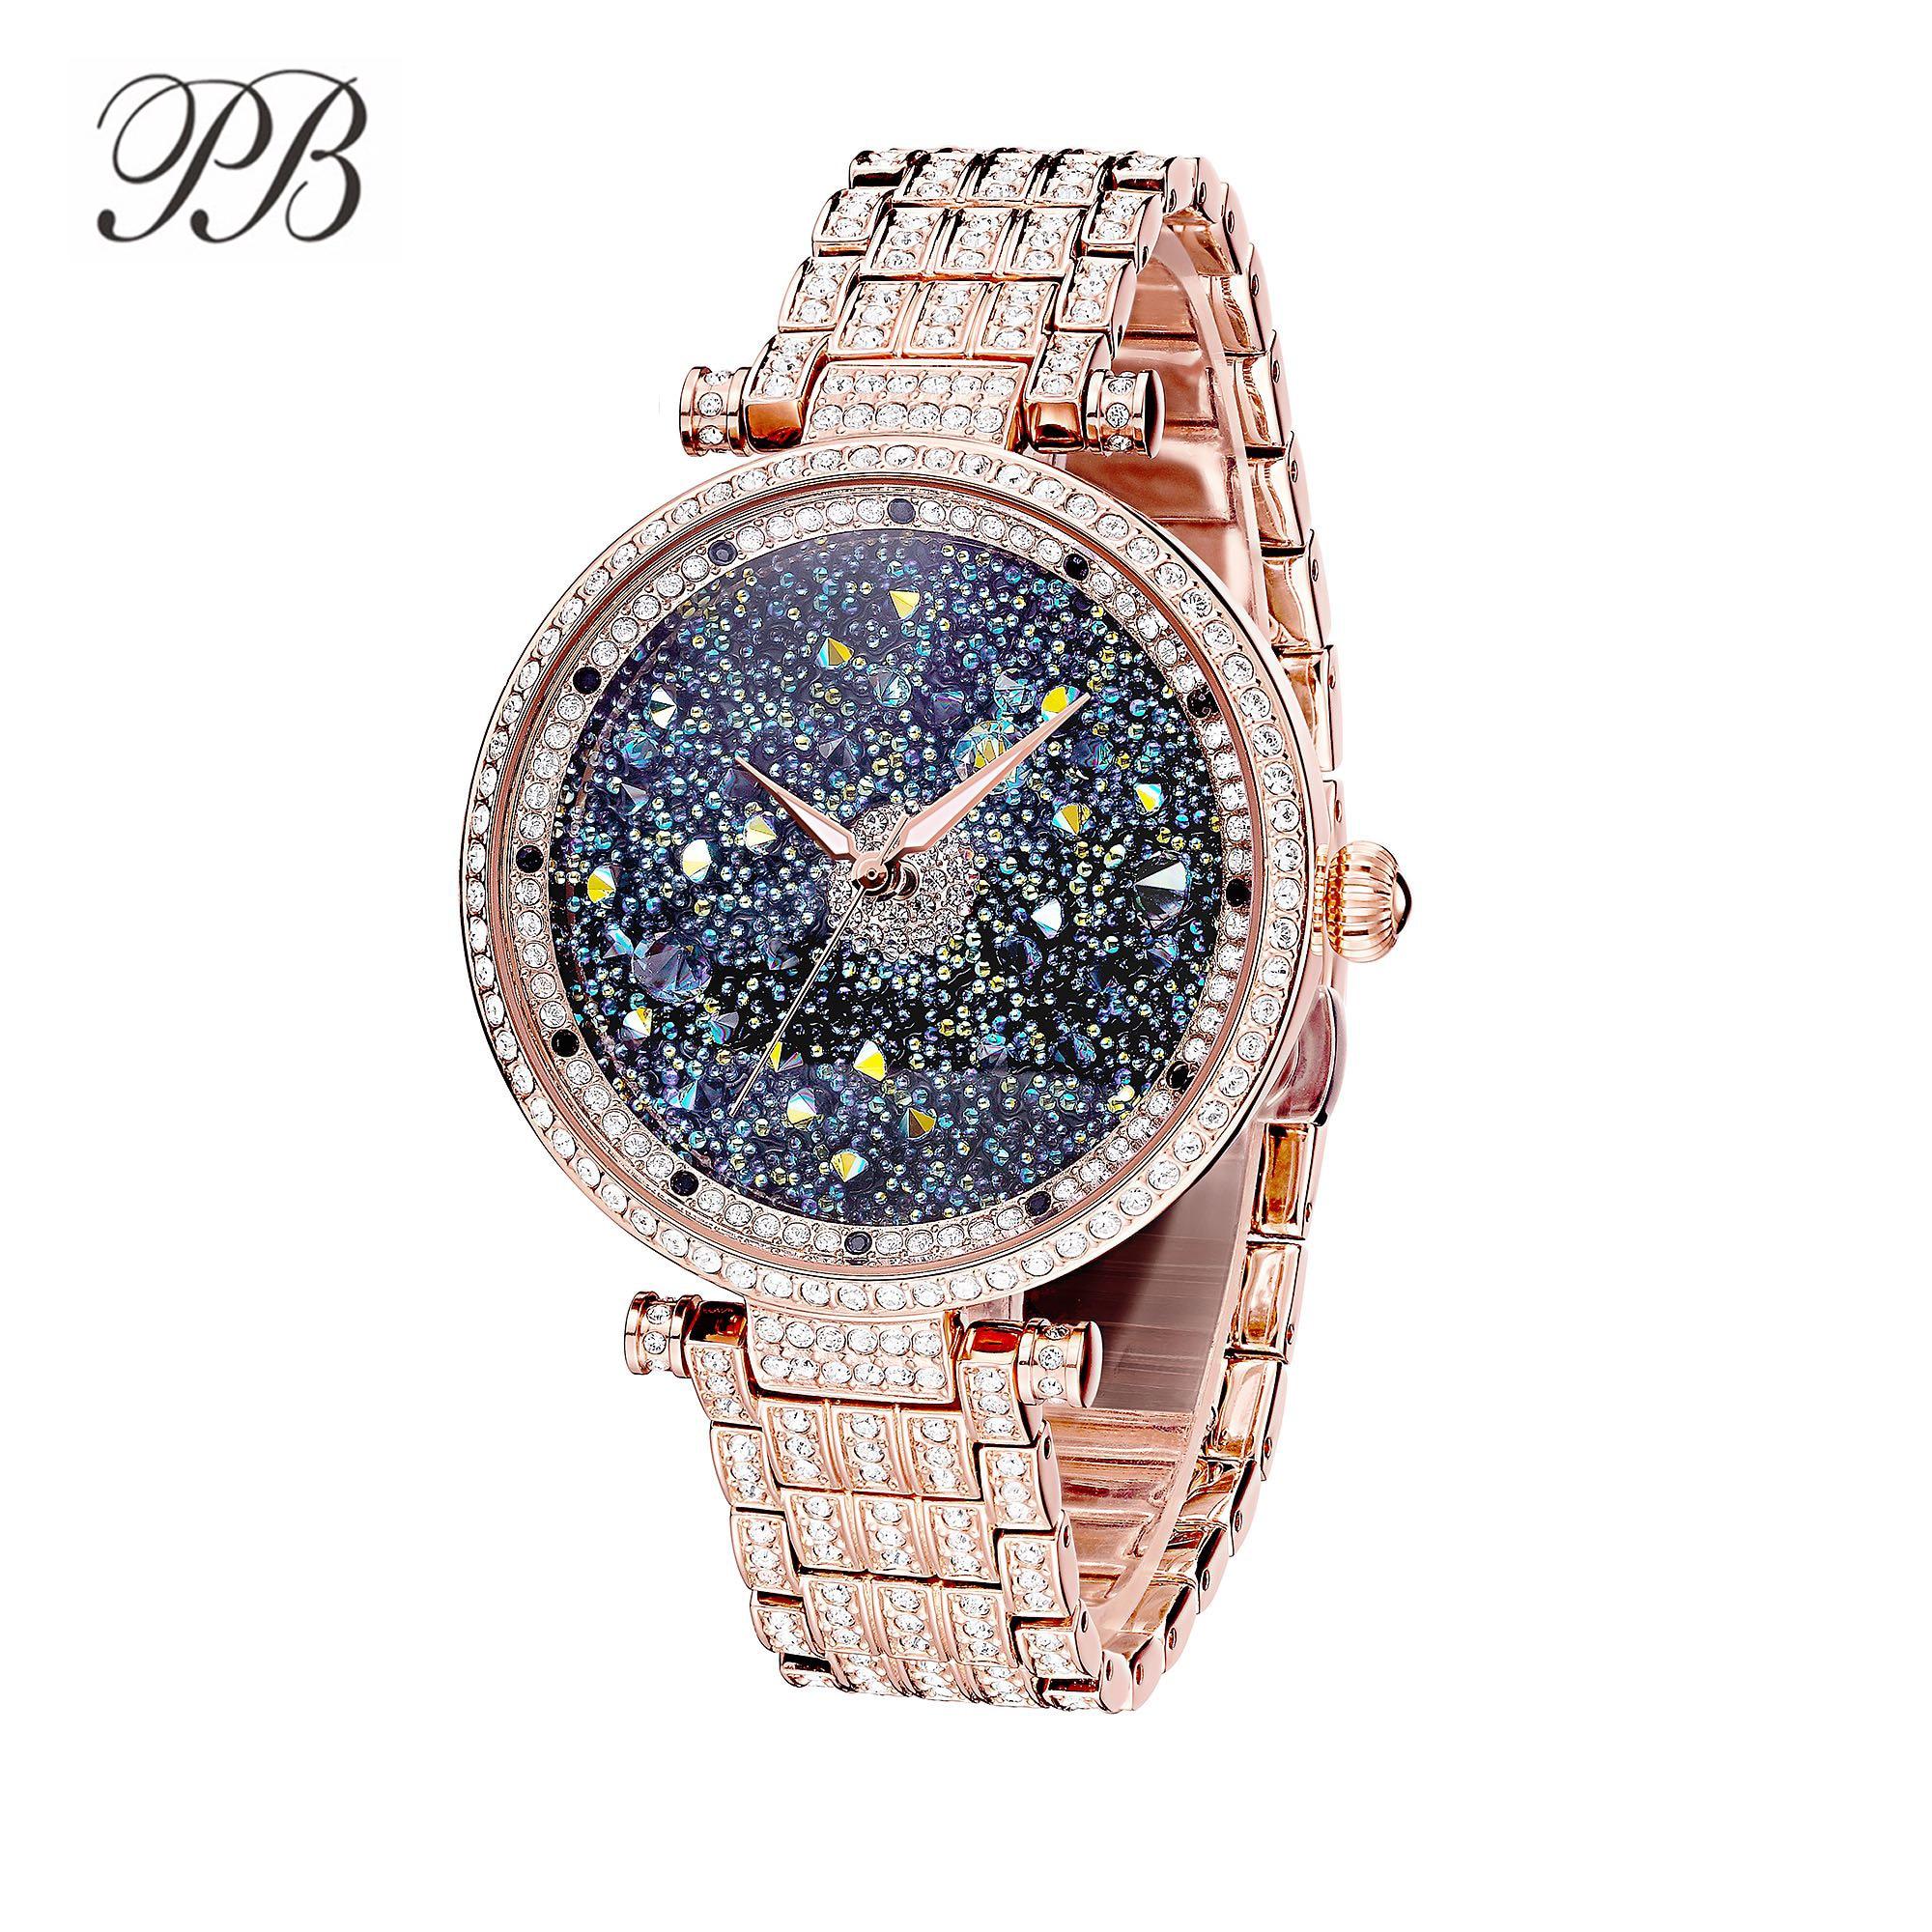 Princess Butterfly Brand Luxury Starry Sky Women Watches Rhinestone Crystal Waterproof Quartz Silver&Rose Gold Watch Women